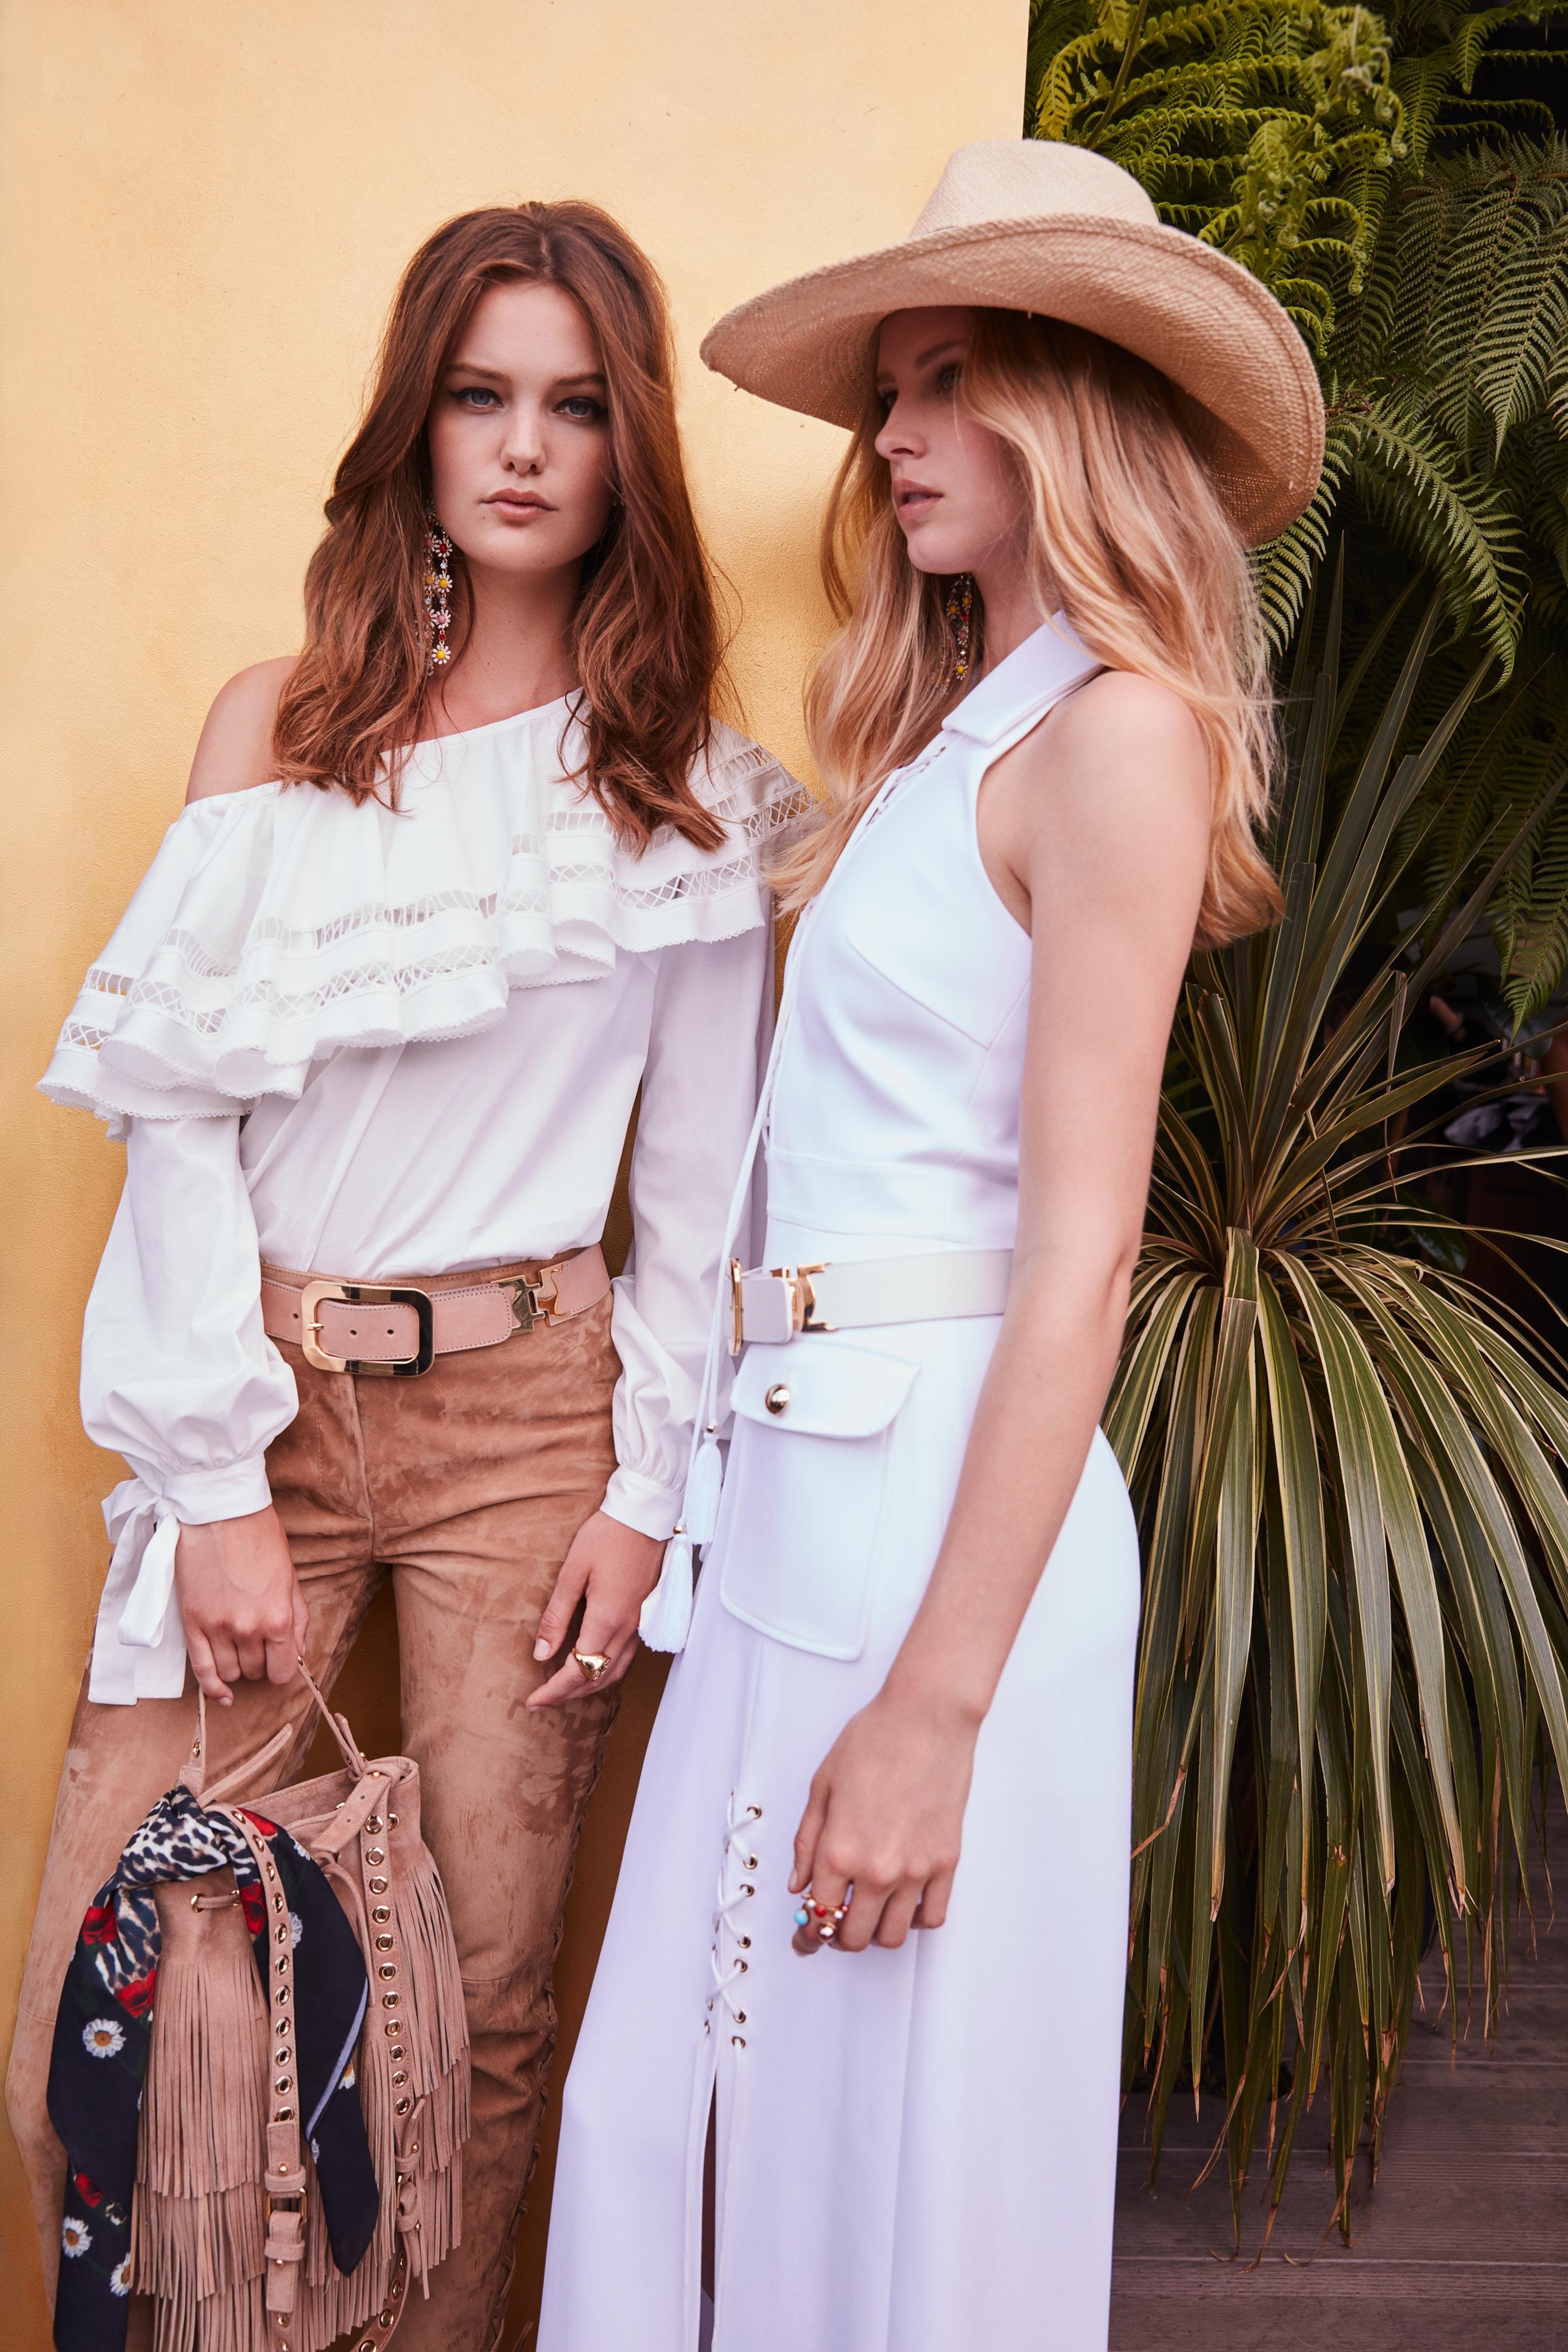 00009-Elie-Saab-Vogue-Resort-2019-pr